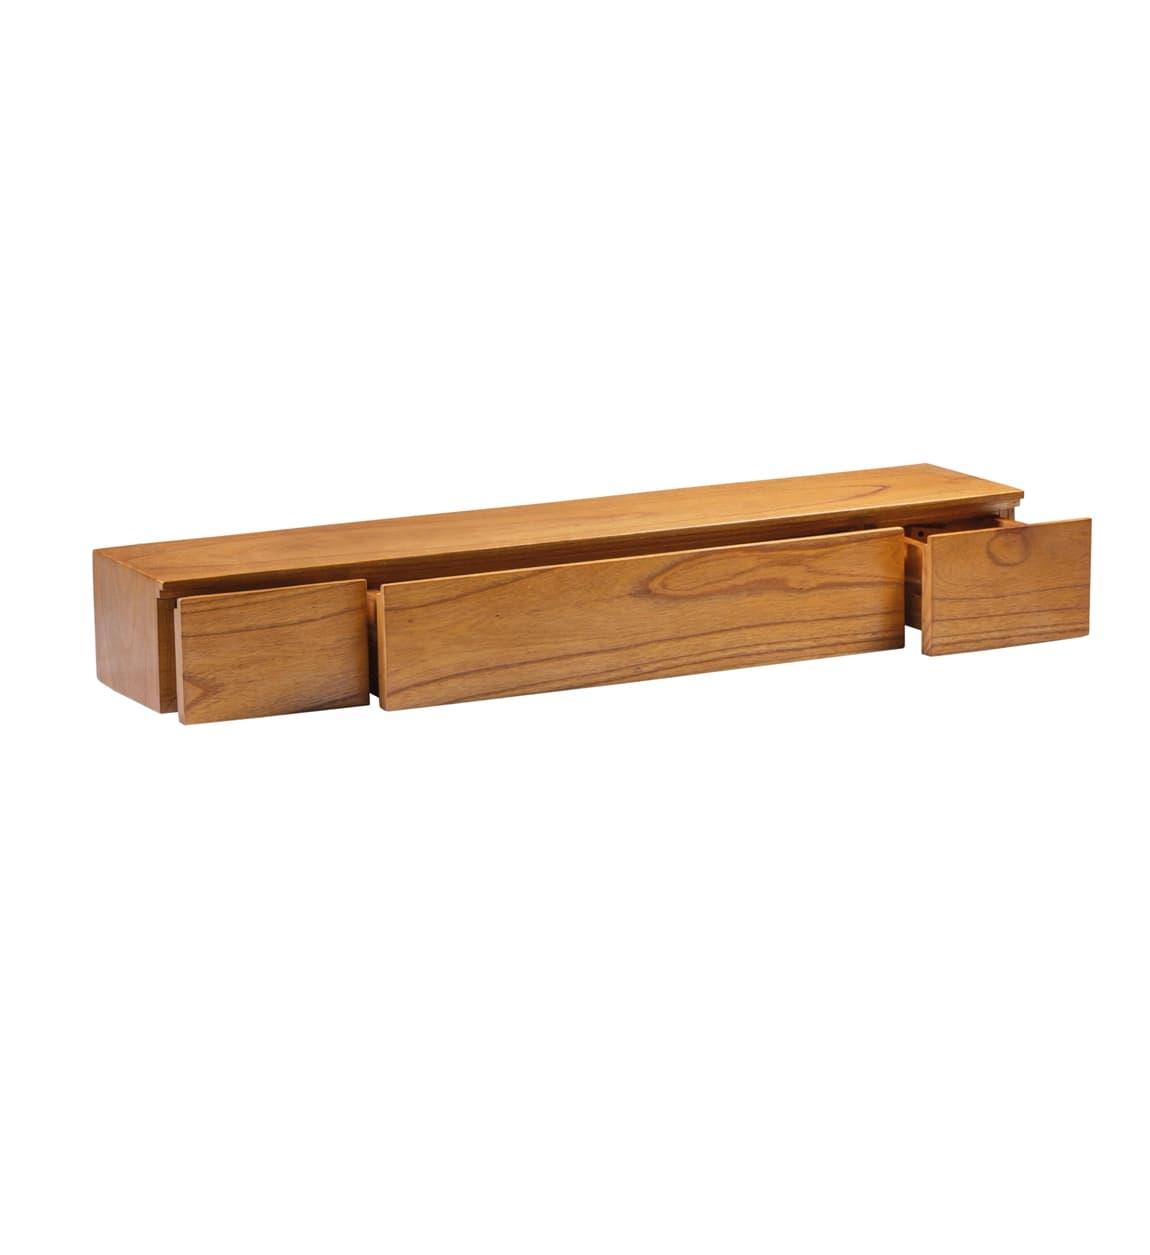 Etajera suspendata din lemn cu 3 sertare, Madhu Natural, l100xA20xH14 cm somproduct.ro